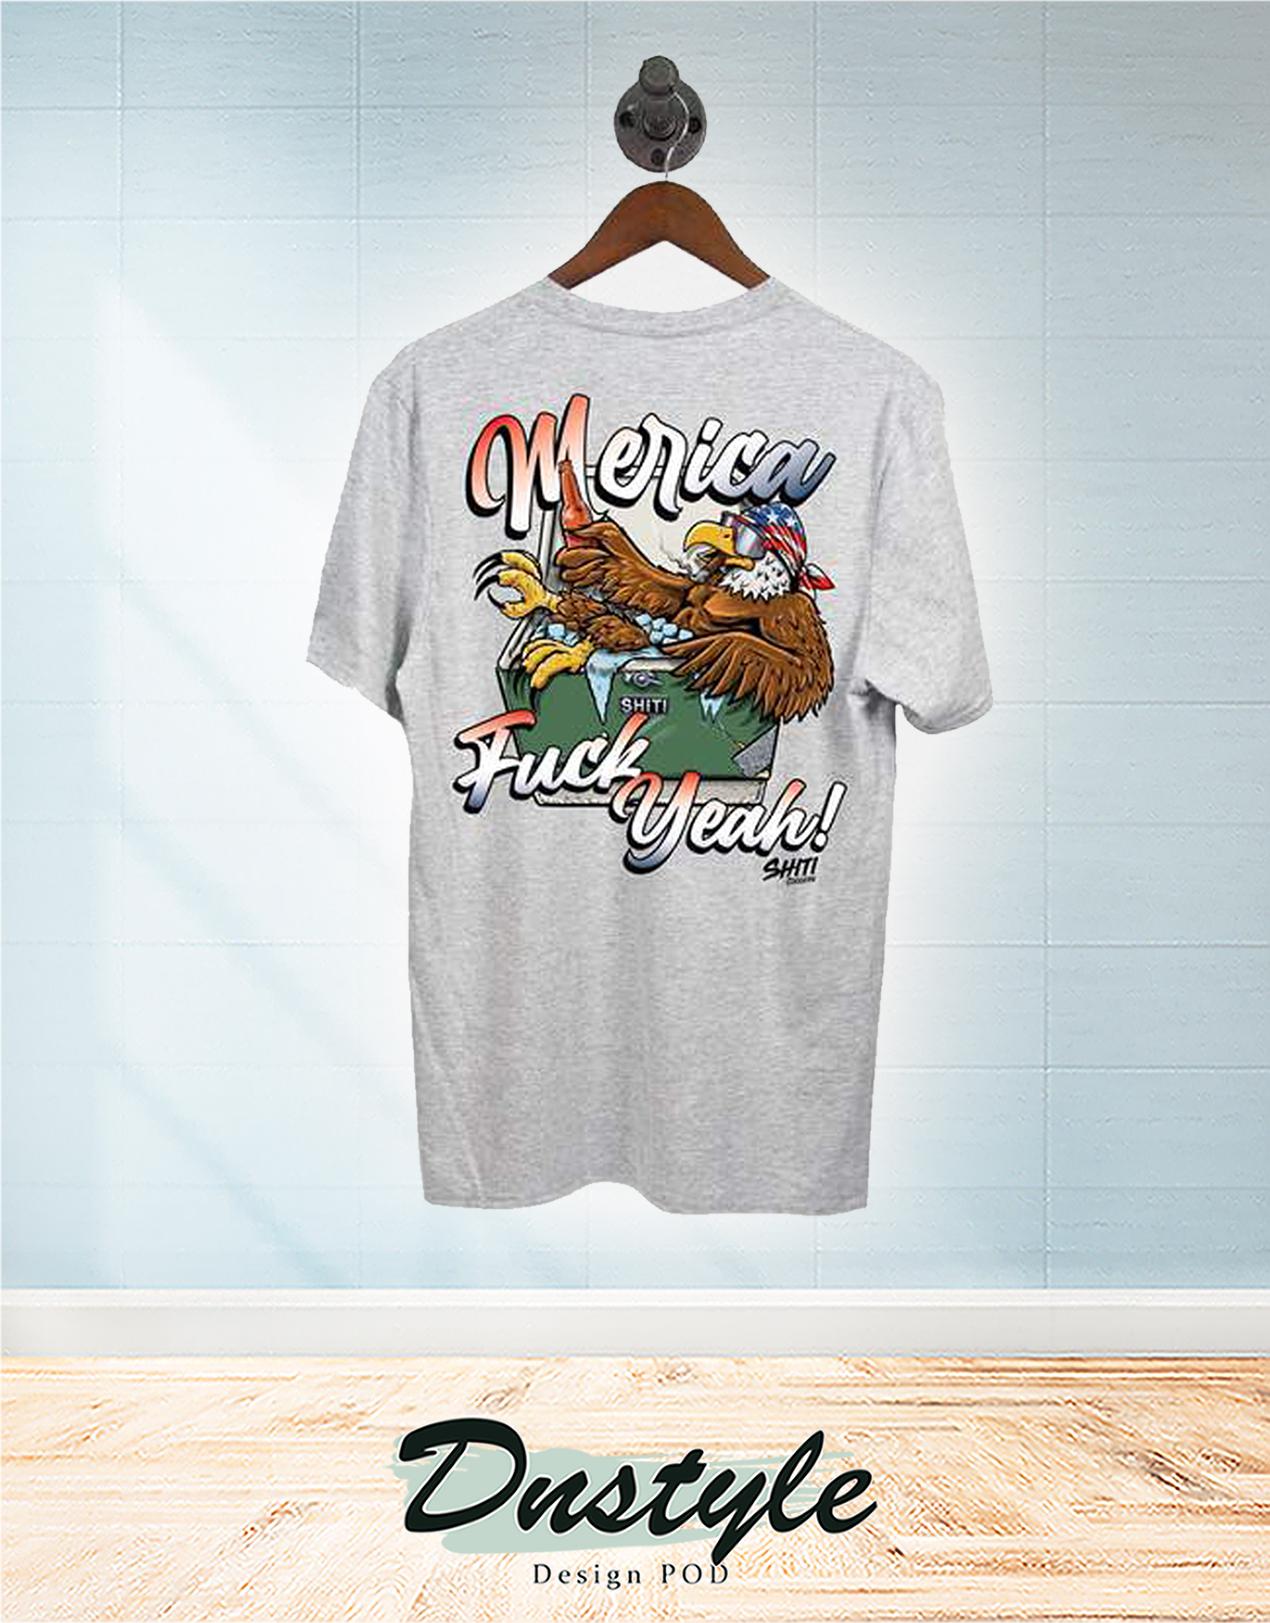 Eagle merica fuck yeah t-shirt 2